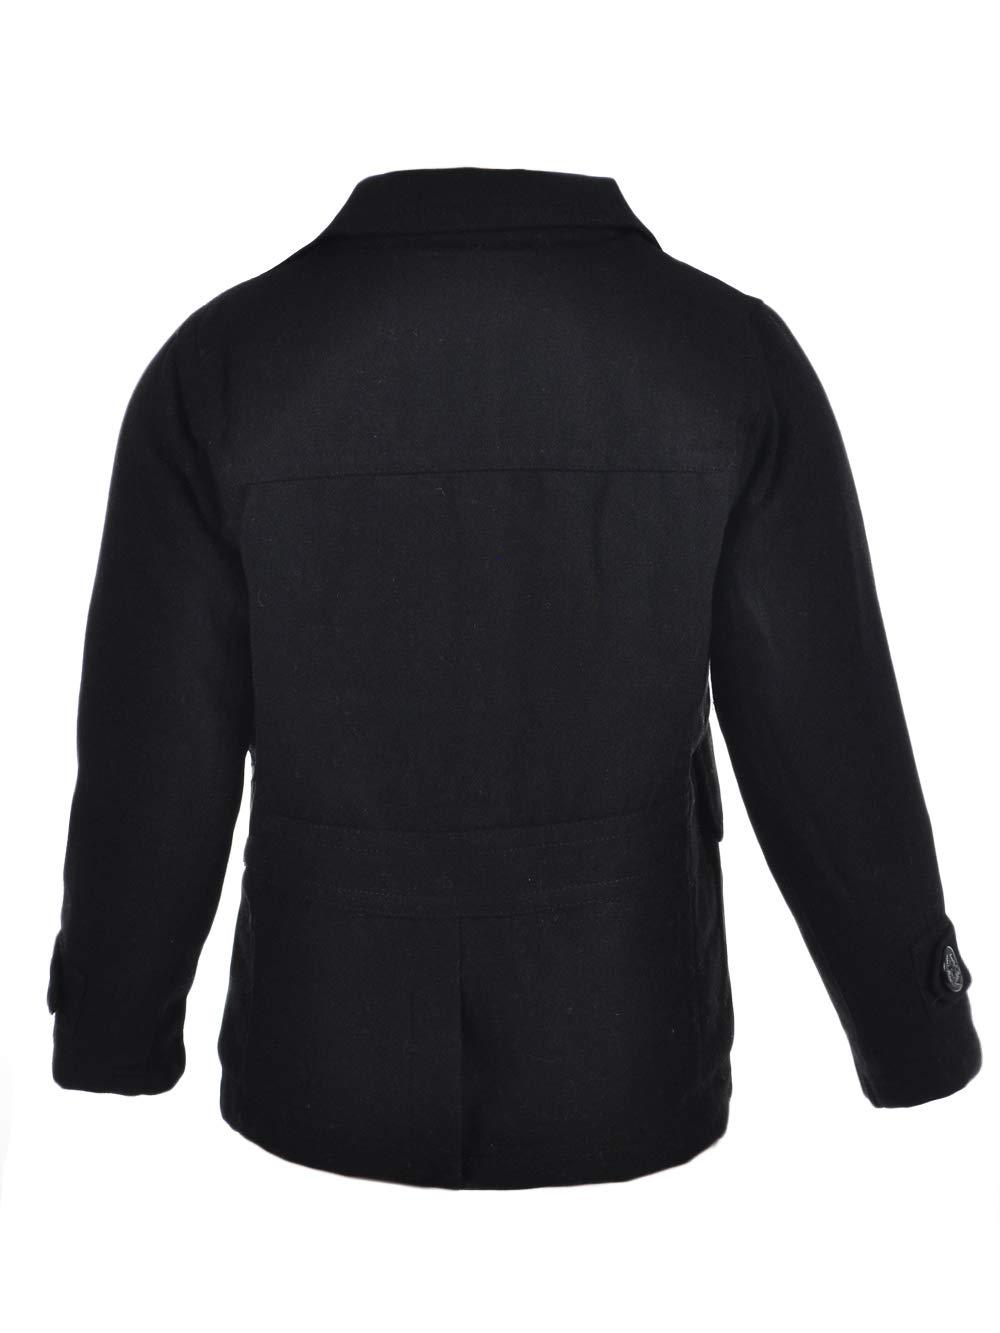 Urban Republic Big Boys' Wool Peacoat - Black, 10-12 by Urban Republic (Image #3)